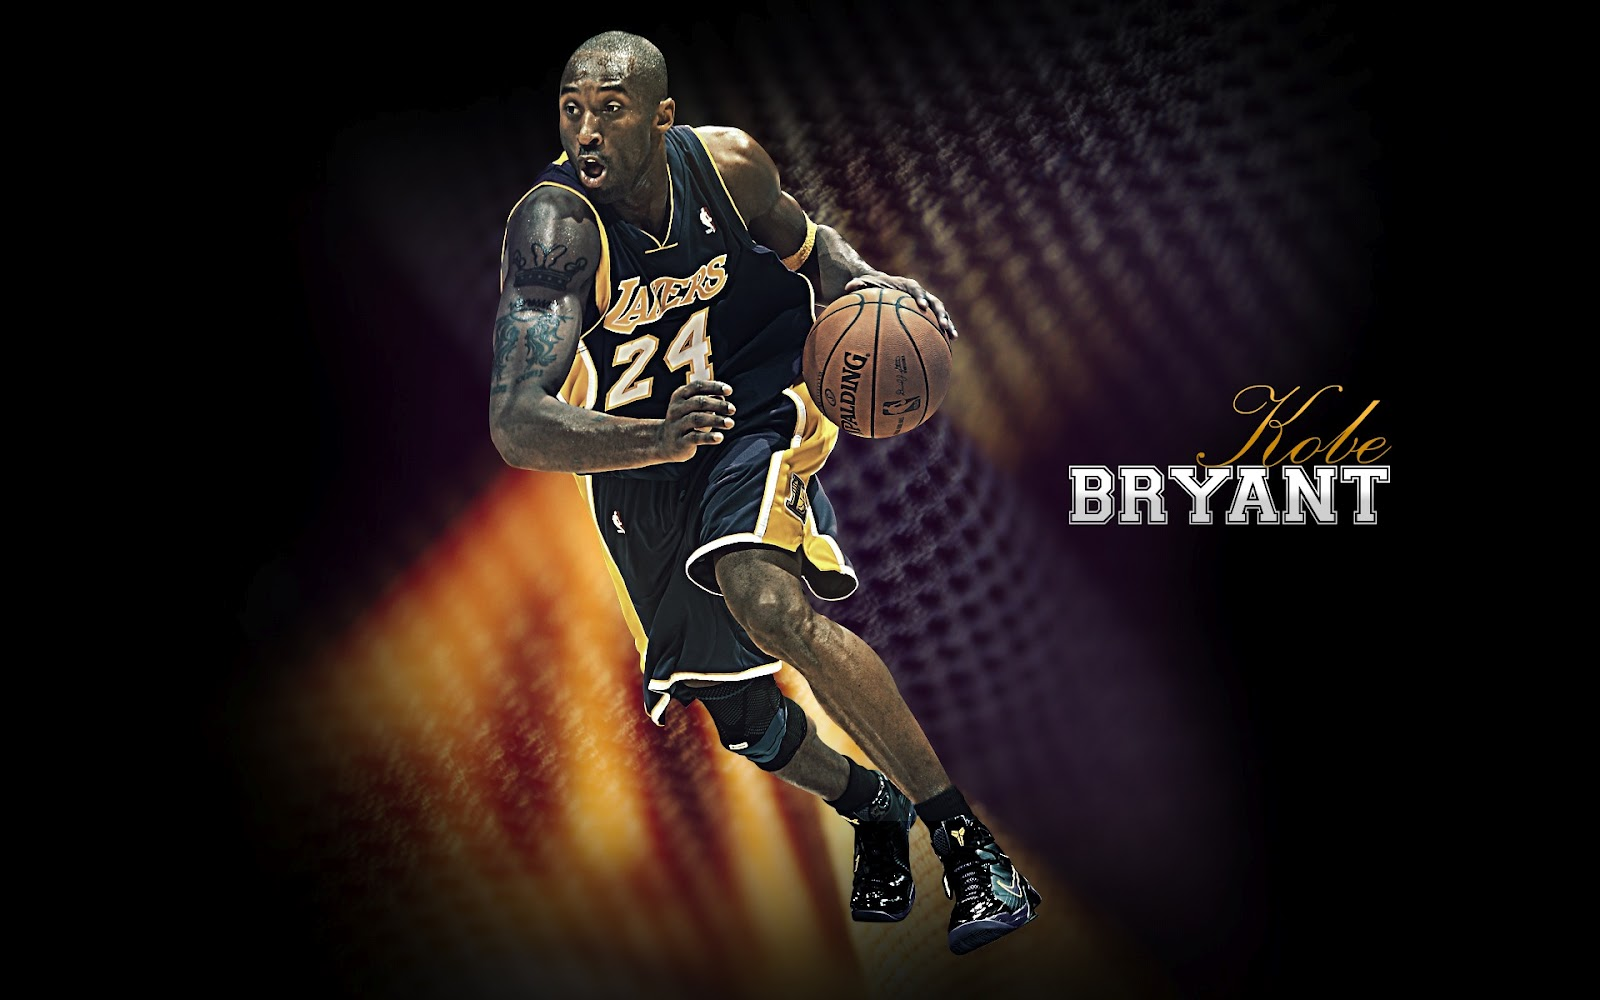 Kobe Bryant New HD Wallpapers 2013 1600x1000